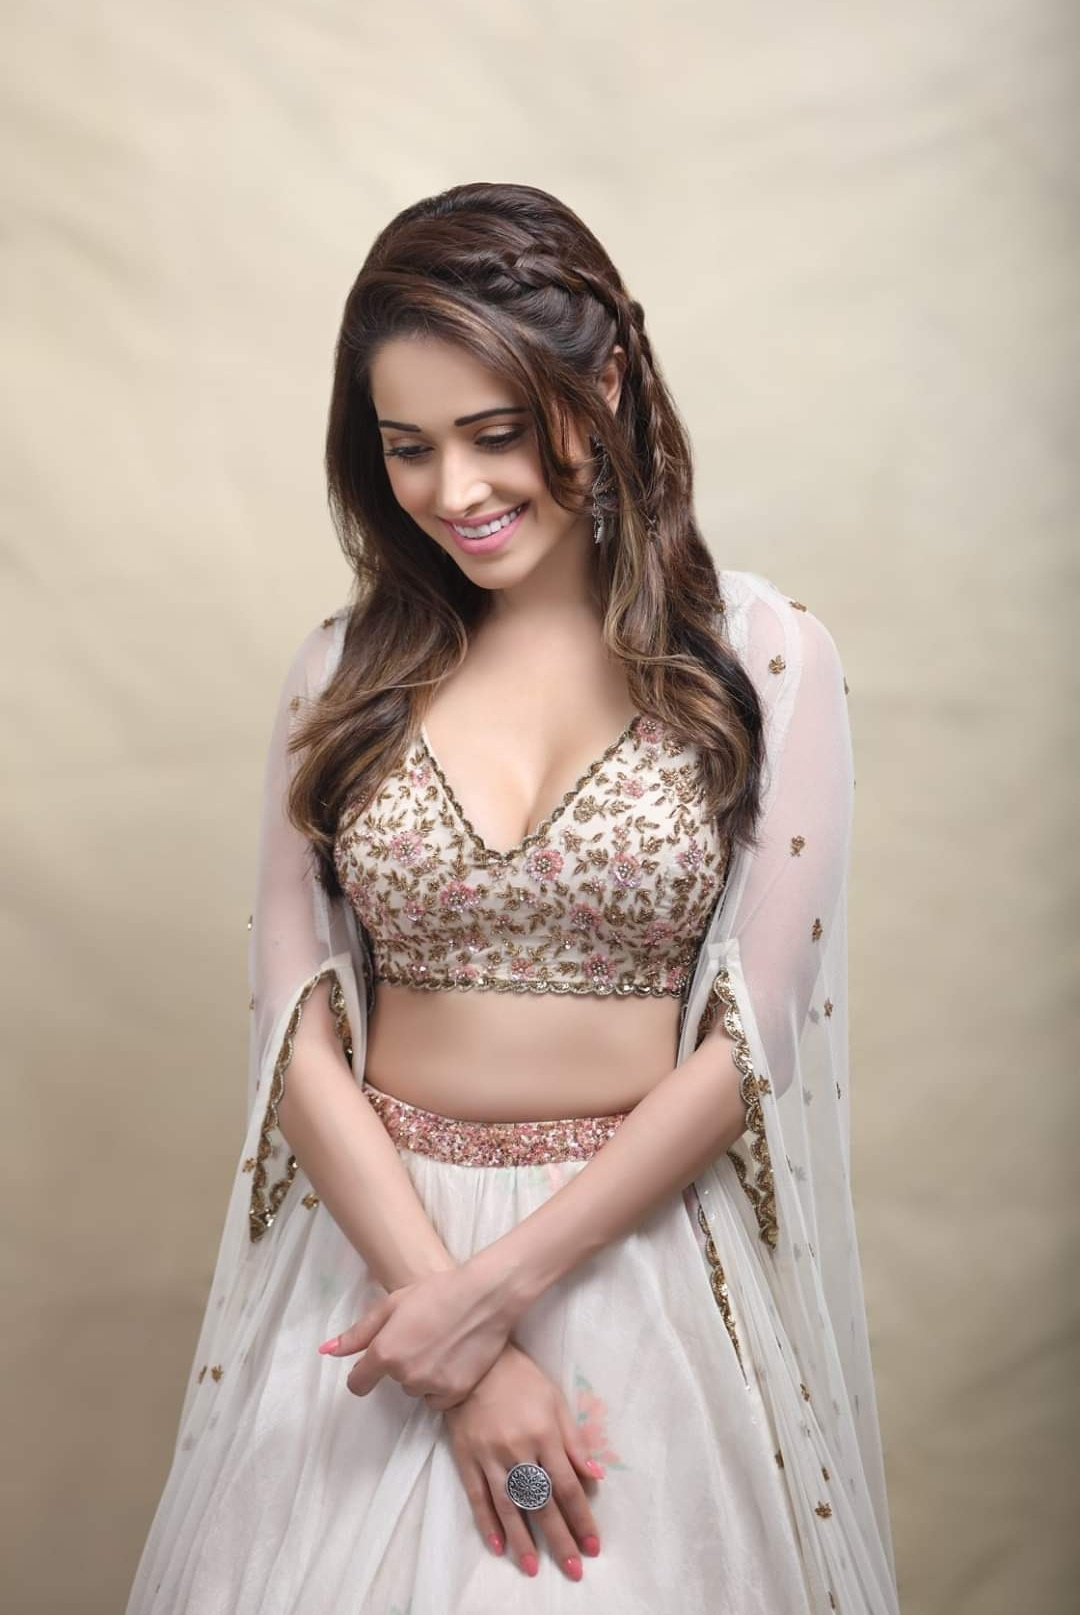 nushrat bharucha with cute smile